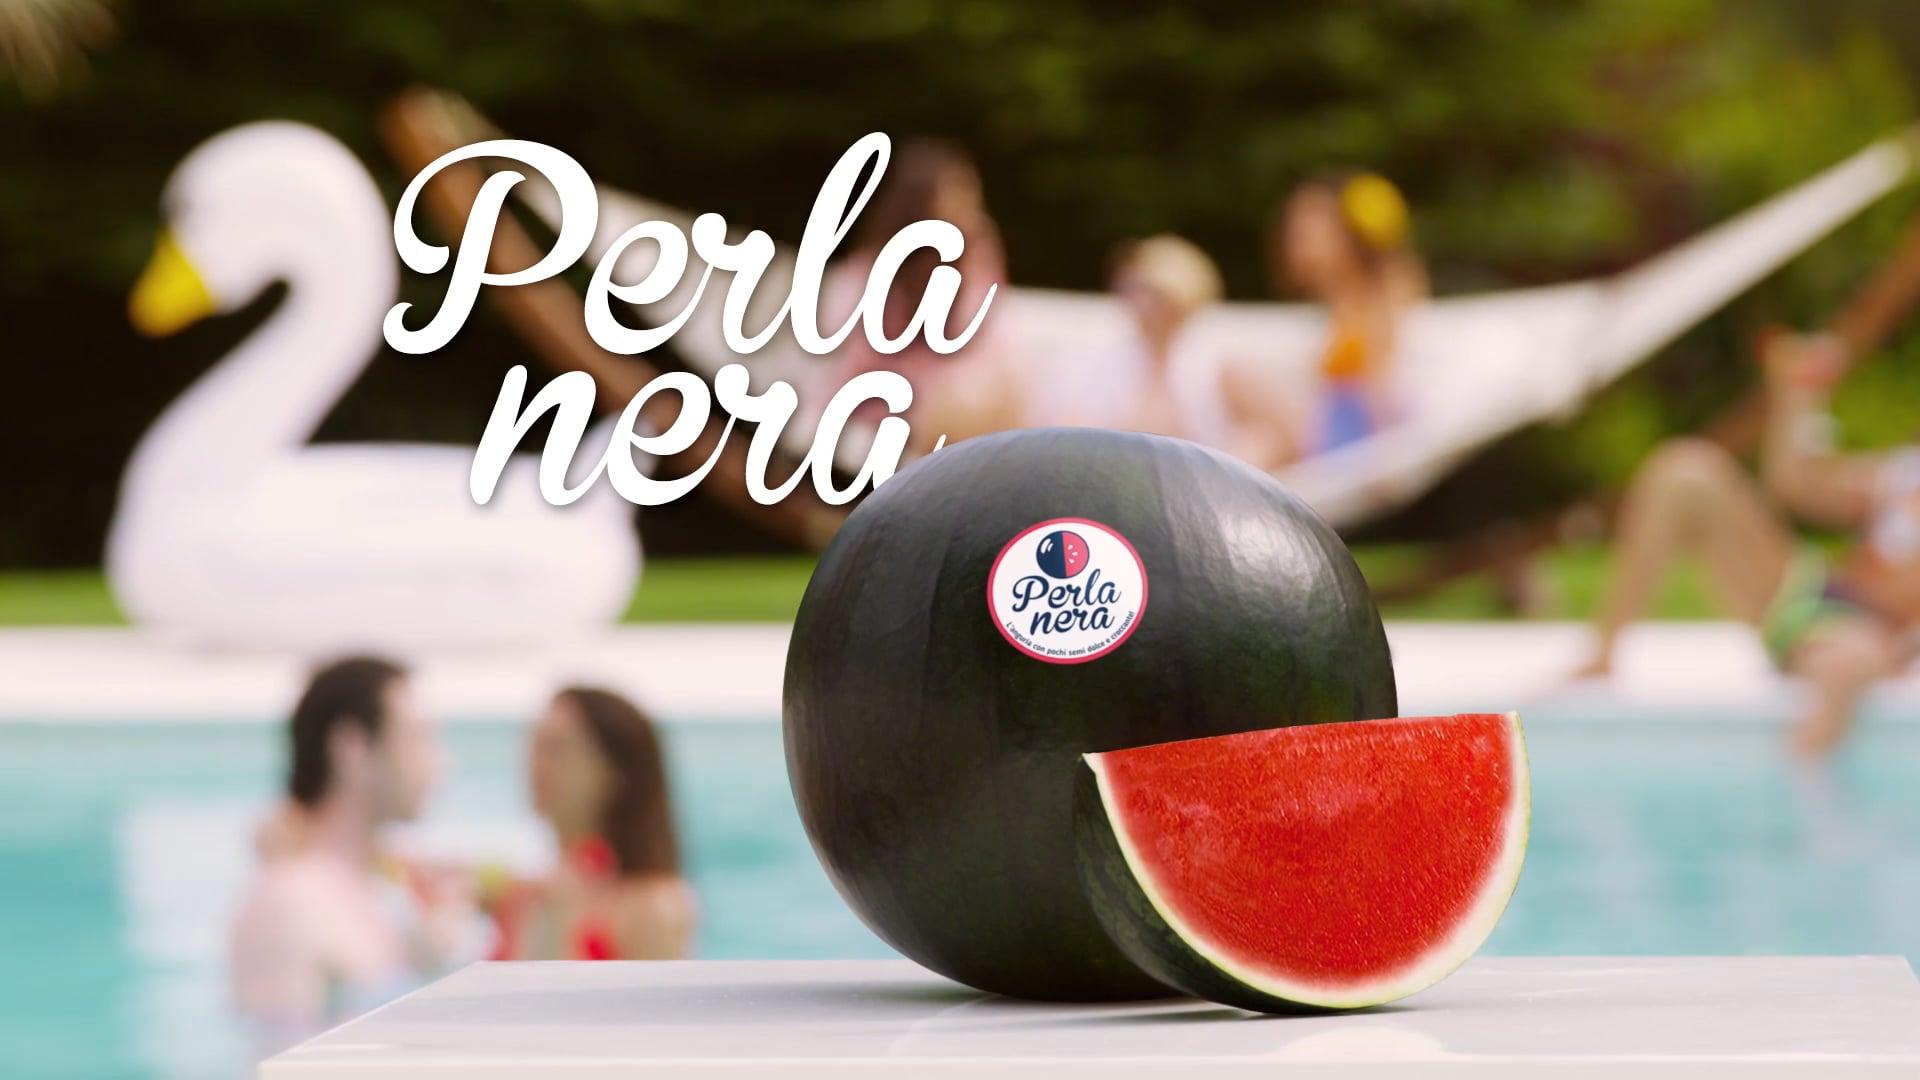 Perla Nera Spot 15s